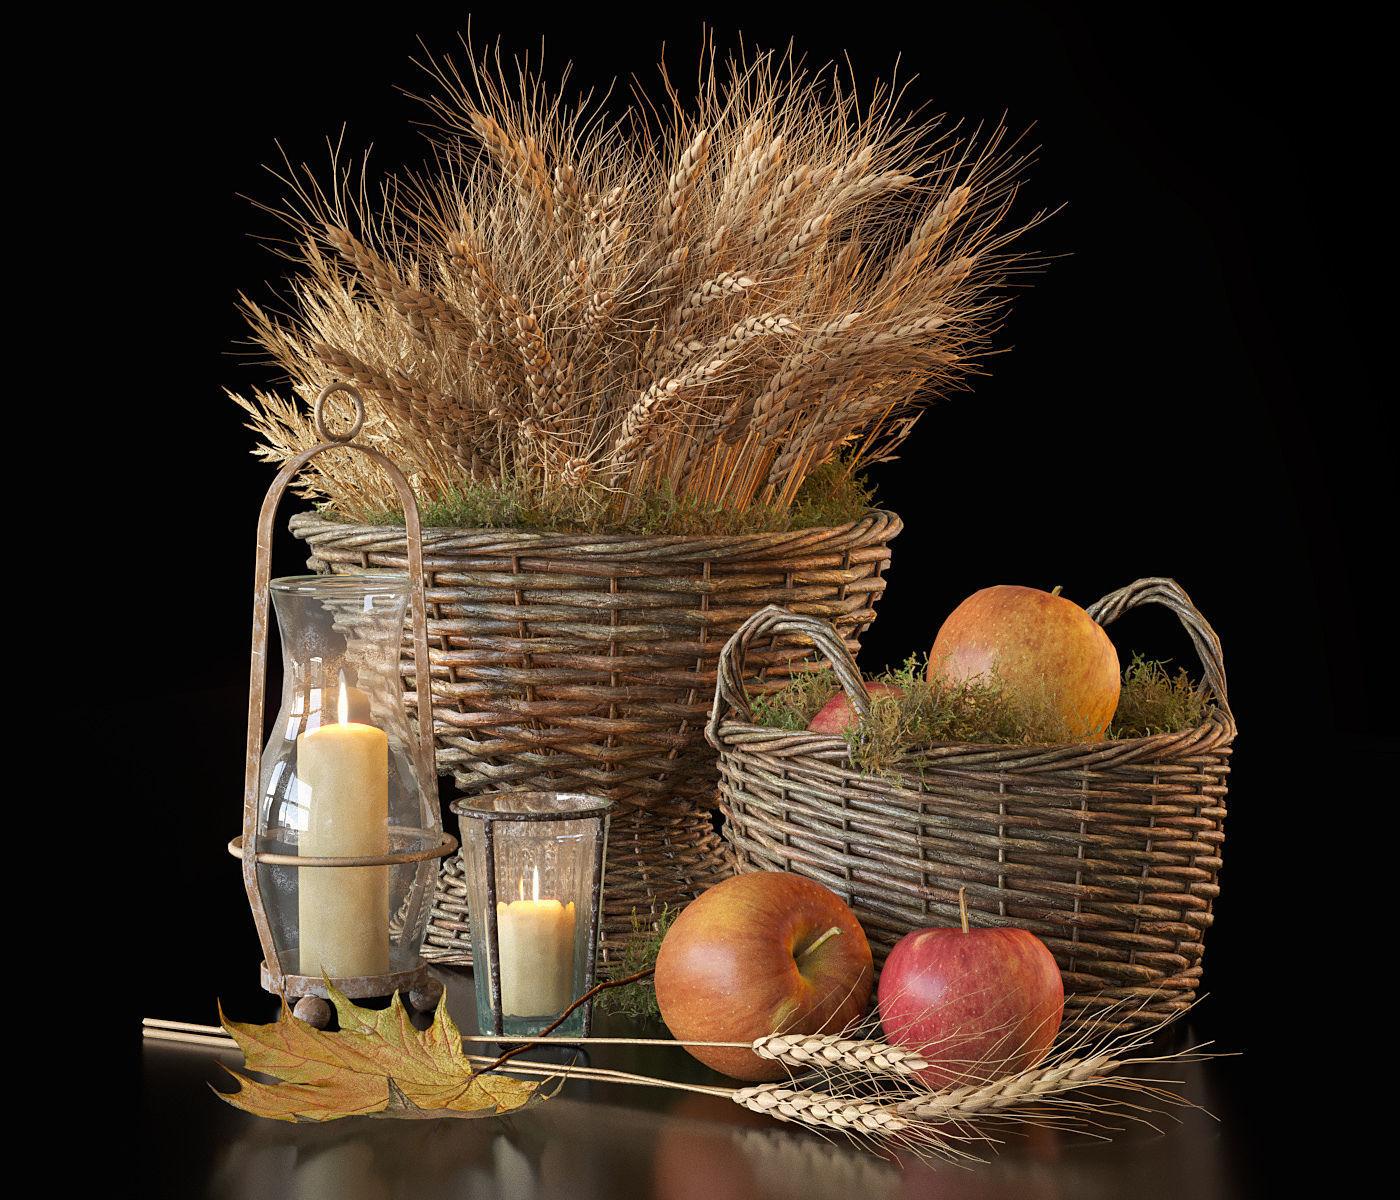 Decorative set with baskets